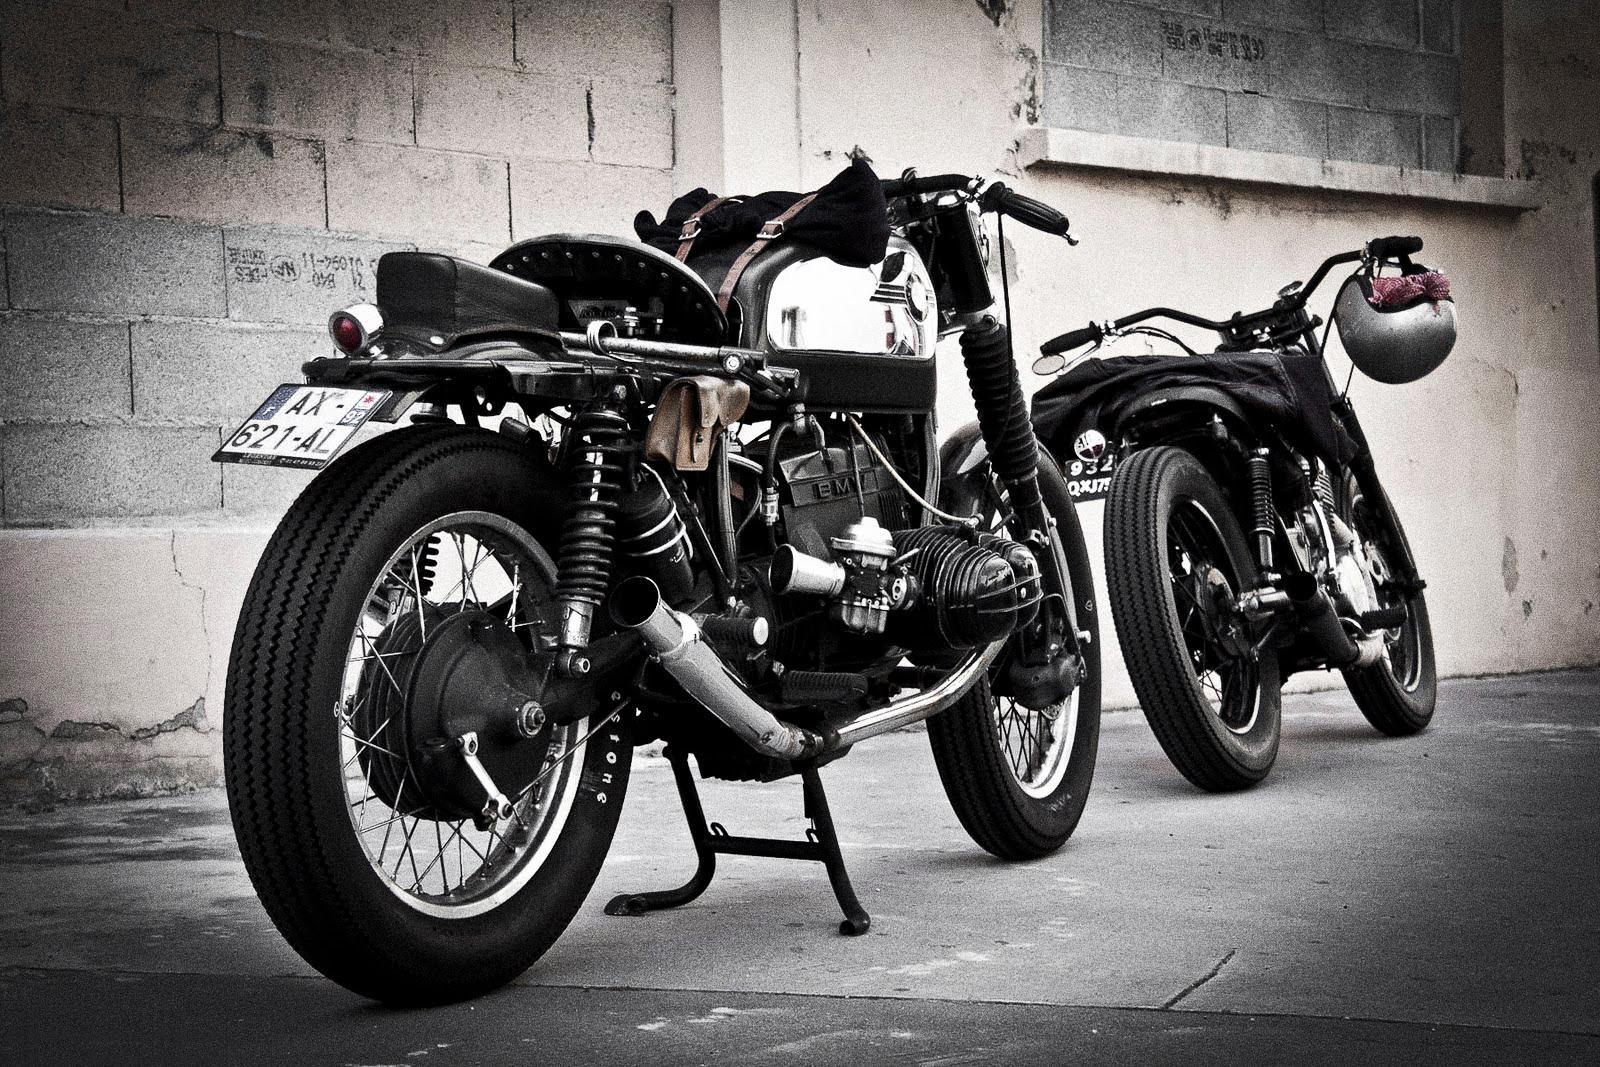 http://1.bp.blogspot.com/-YKlmiMR_SPY/To67qtU2fhI/AAAAAAAAEwQ/0XrqqmUQcPE/s1600/blitz-motorcycles-wallpaper-3.jpg